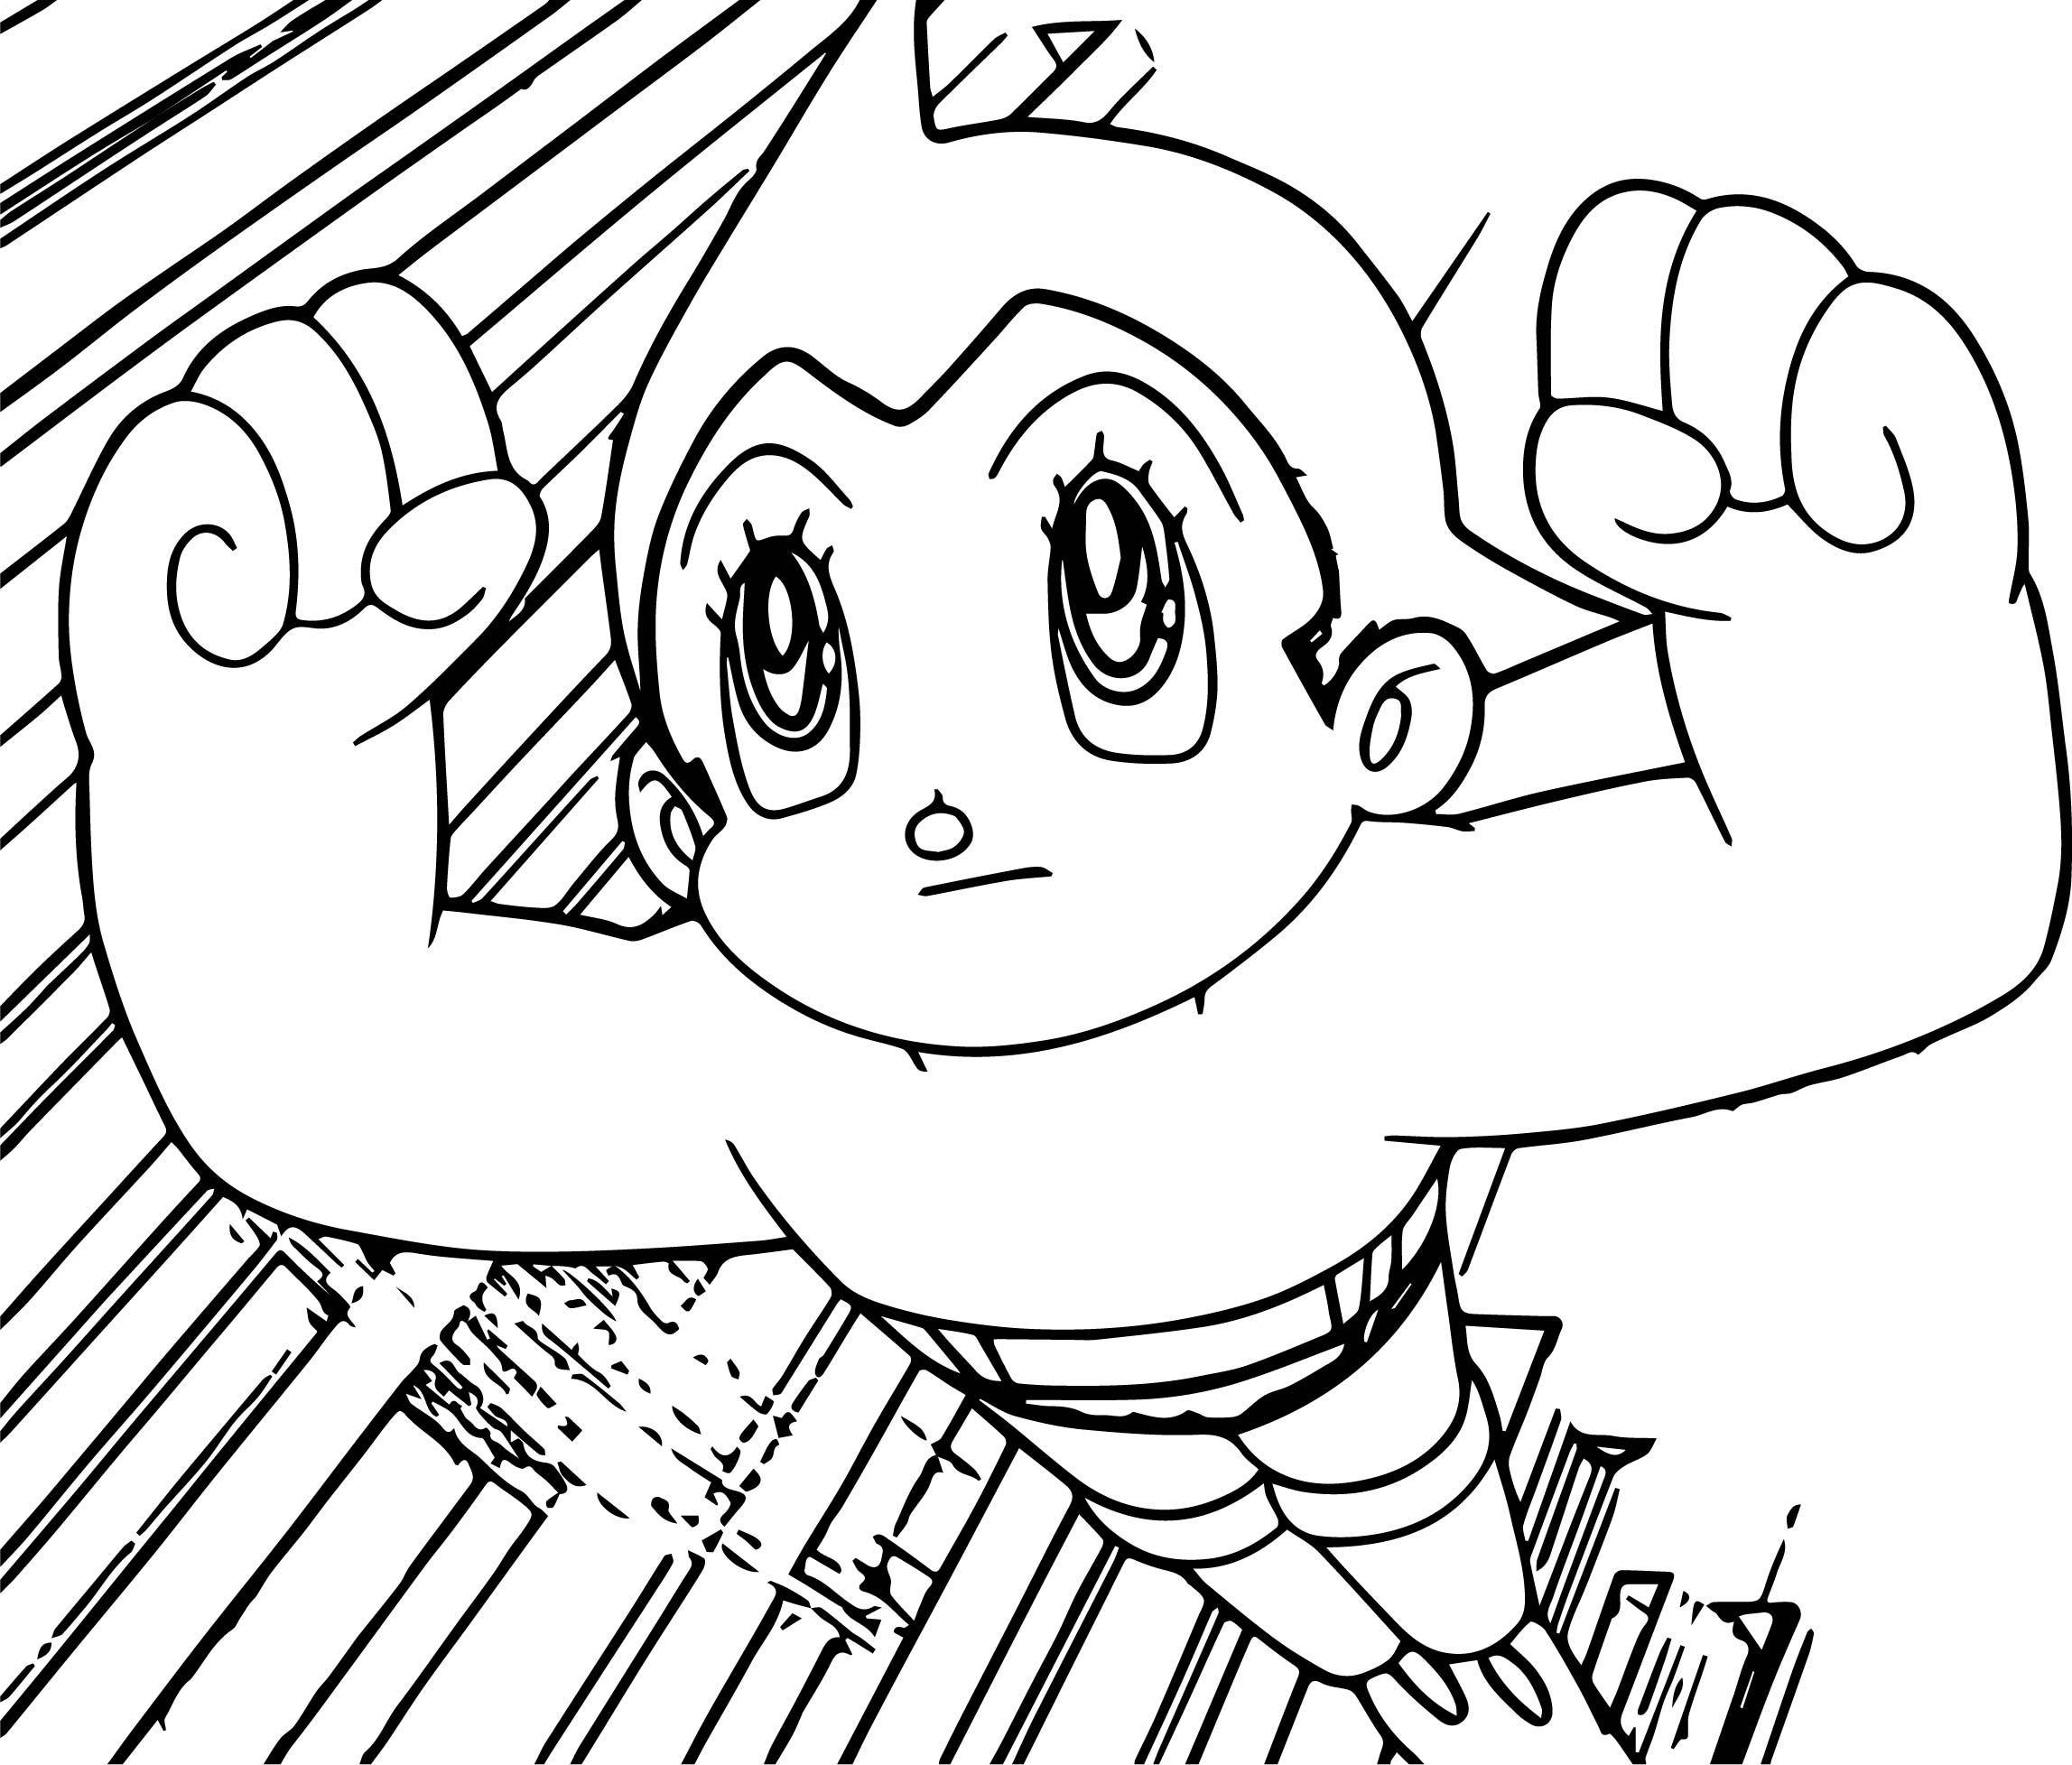 Cool Atom Astro Boy Coloring Page Coloring Pages For Boys Coloring Pages Astro Boy